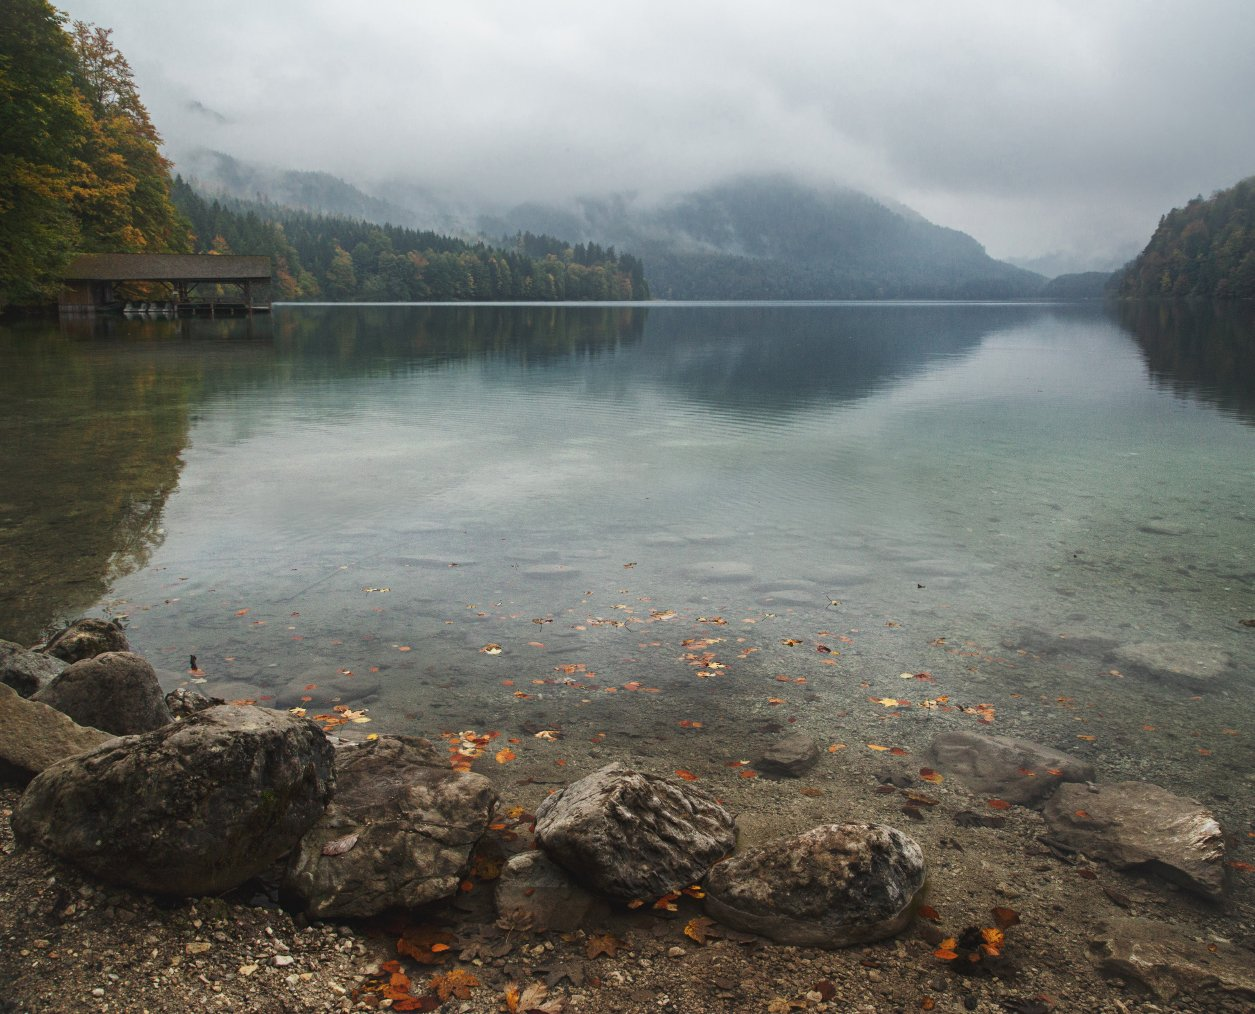 гора; озеро; лес; осень; туризм, Александр Удовиченко